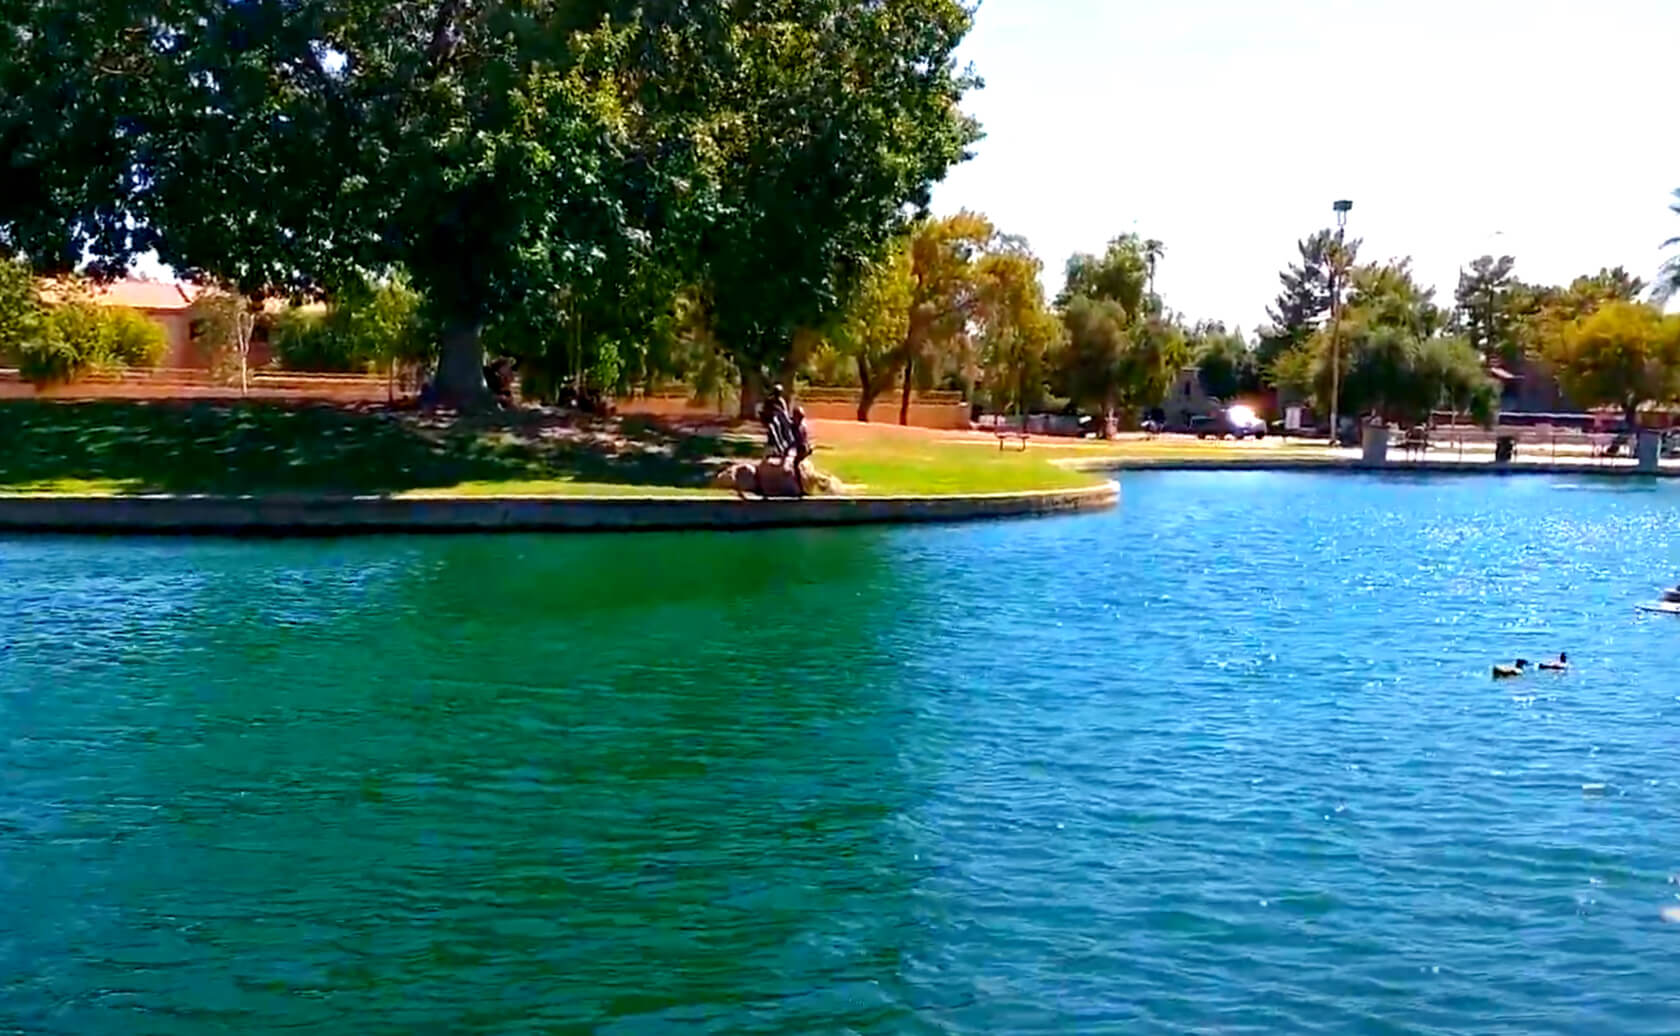 Bonsall-Pond-Lake-Fishing-Guide-Report-Glendale-AZ-06